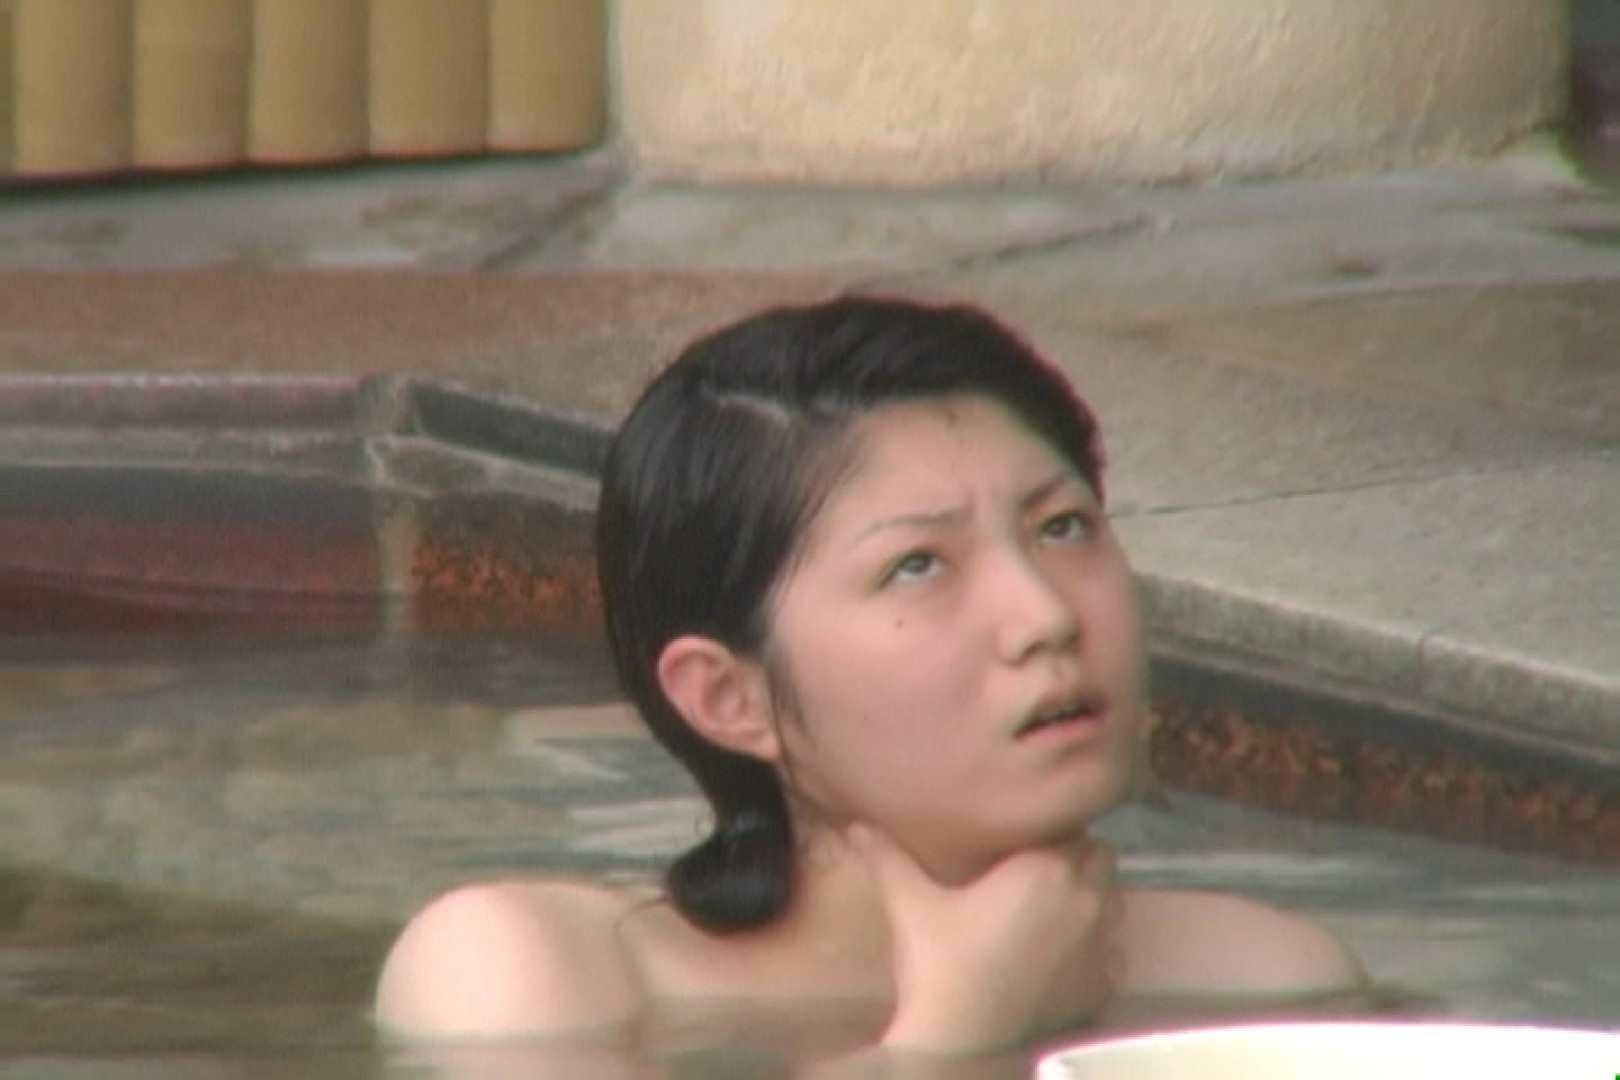 Aquaな露天風呂Vol.579 盗撮 | HなOL  53pic 48